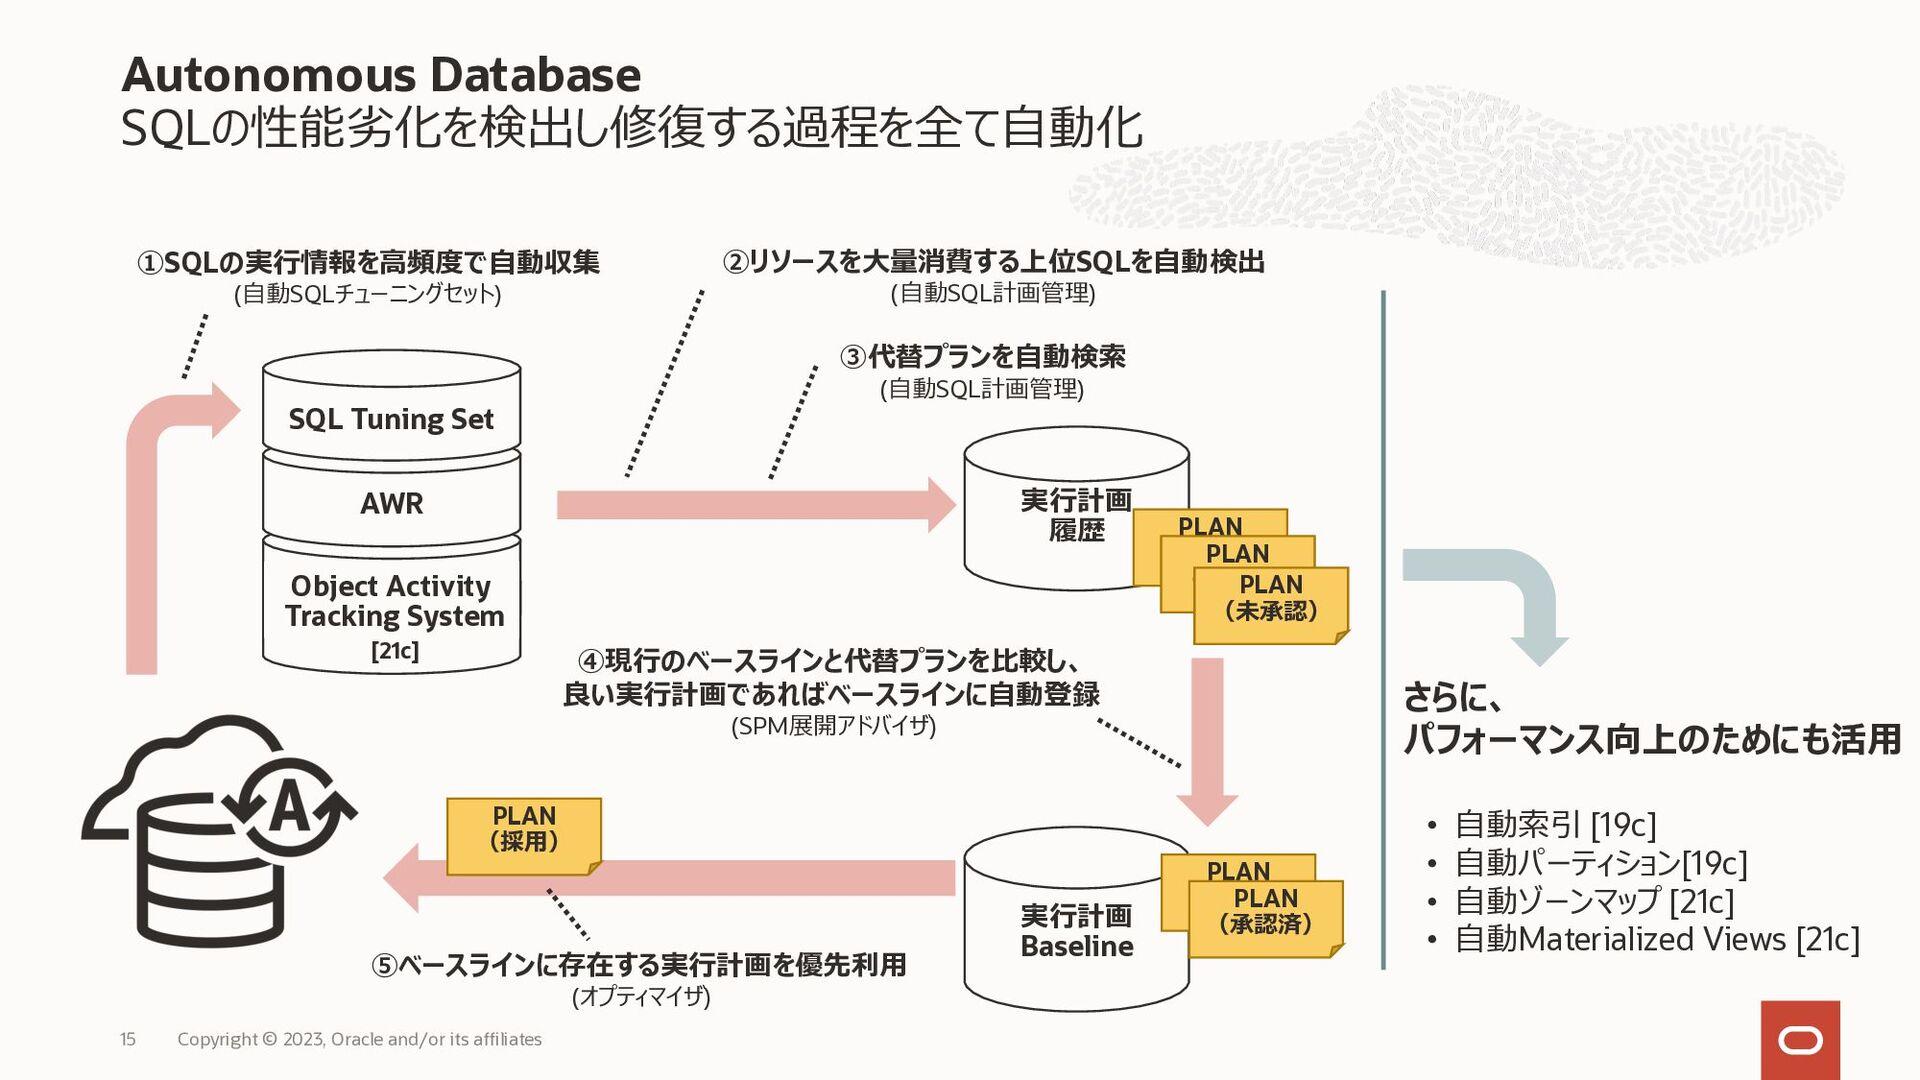 Autonomous Database 各レイヤーでMachine Learningを活用 C...